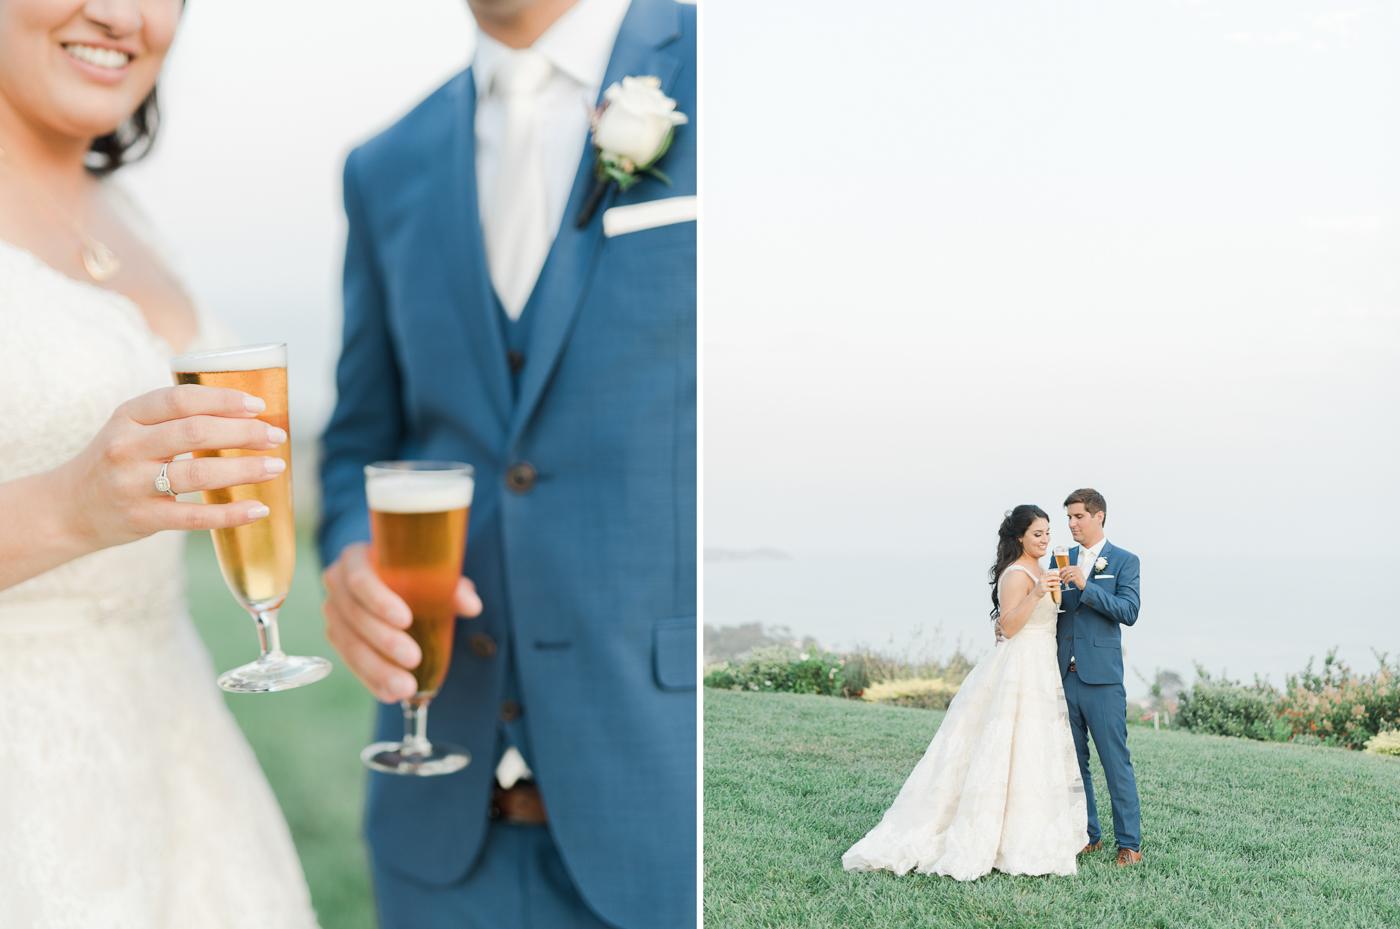 AKP_S&F_Malibu_Wedding_Fine_Art_Photography_Los_Angeles-49.jpg